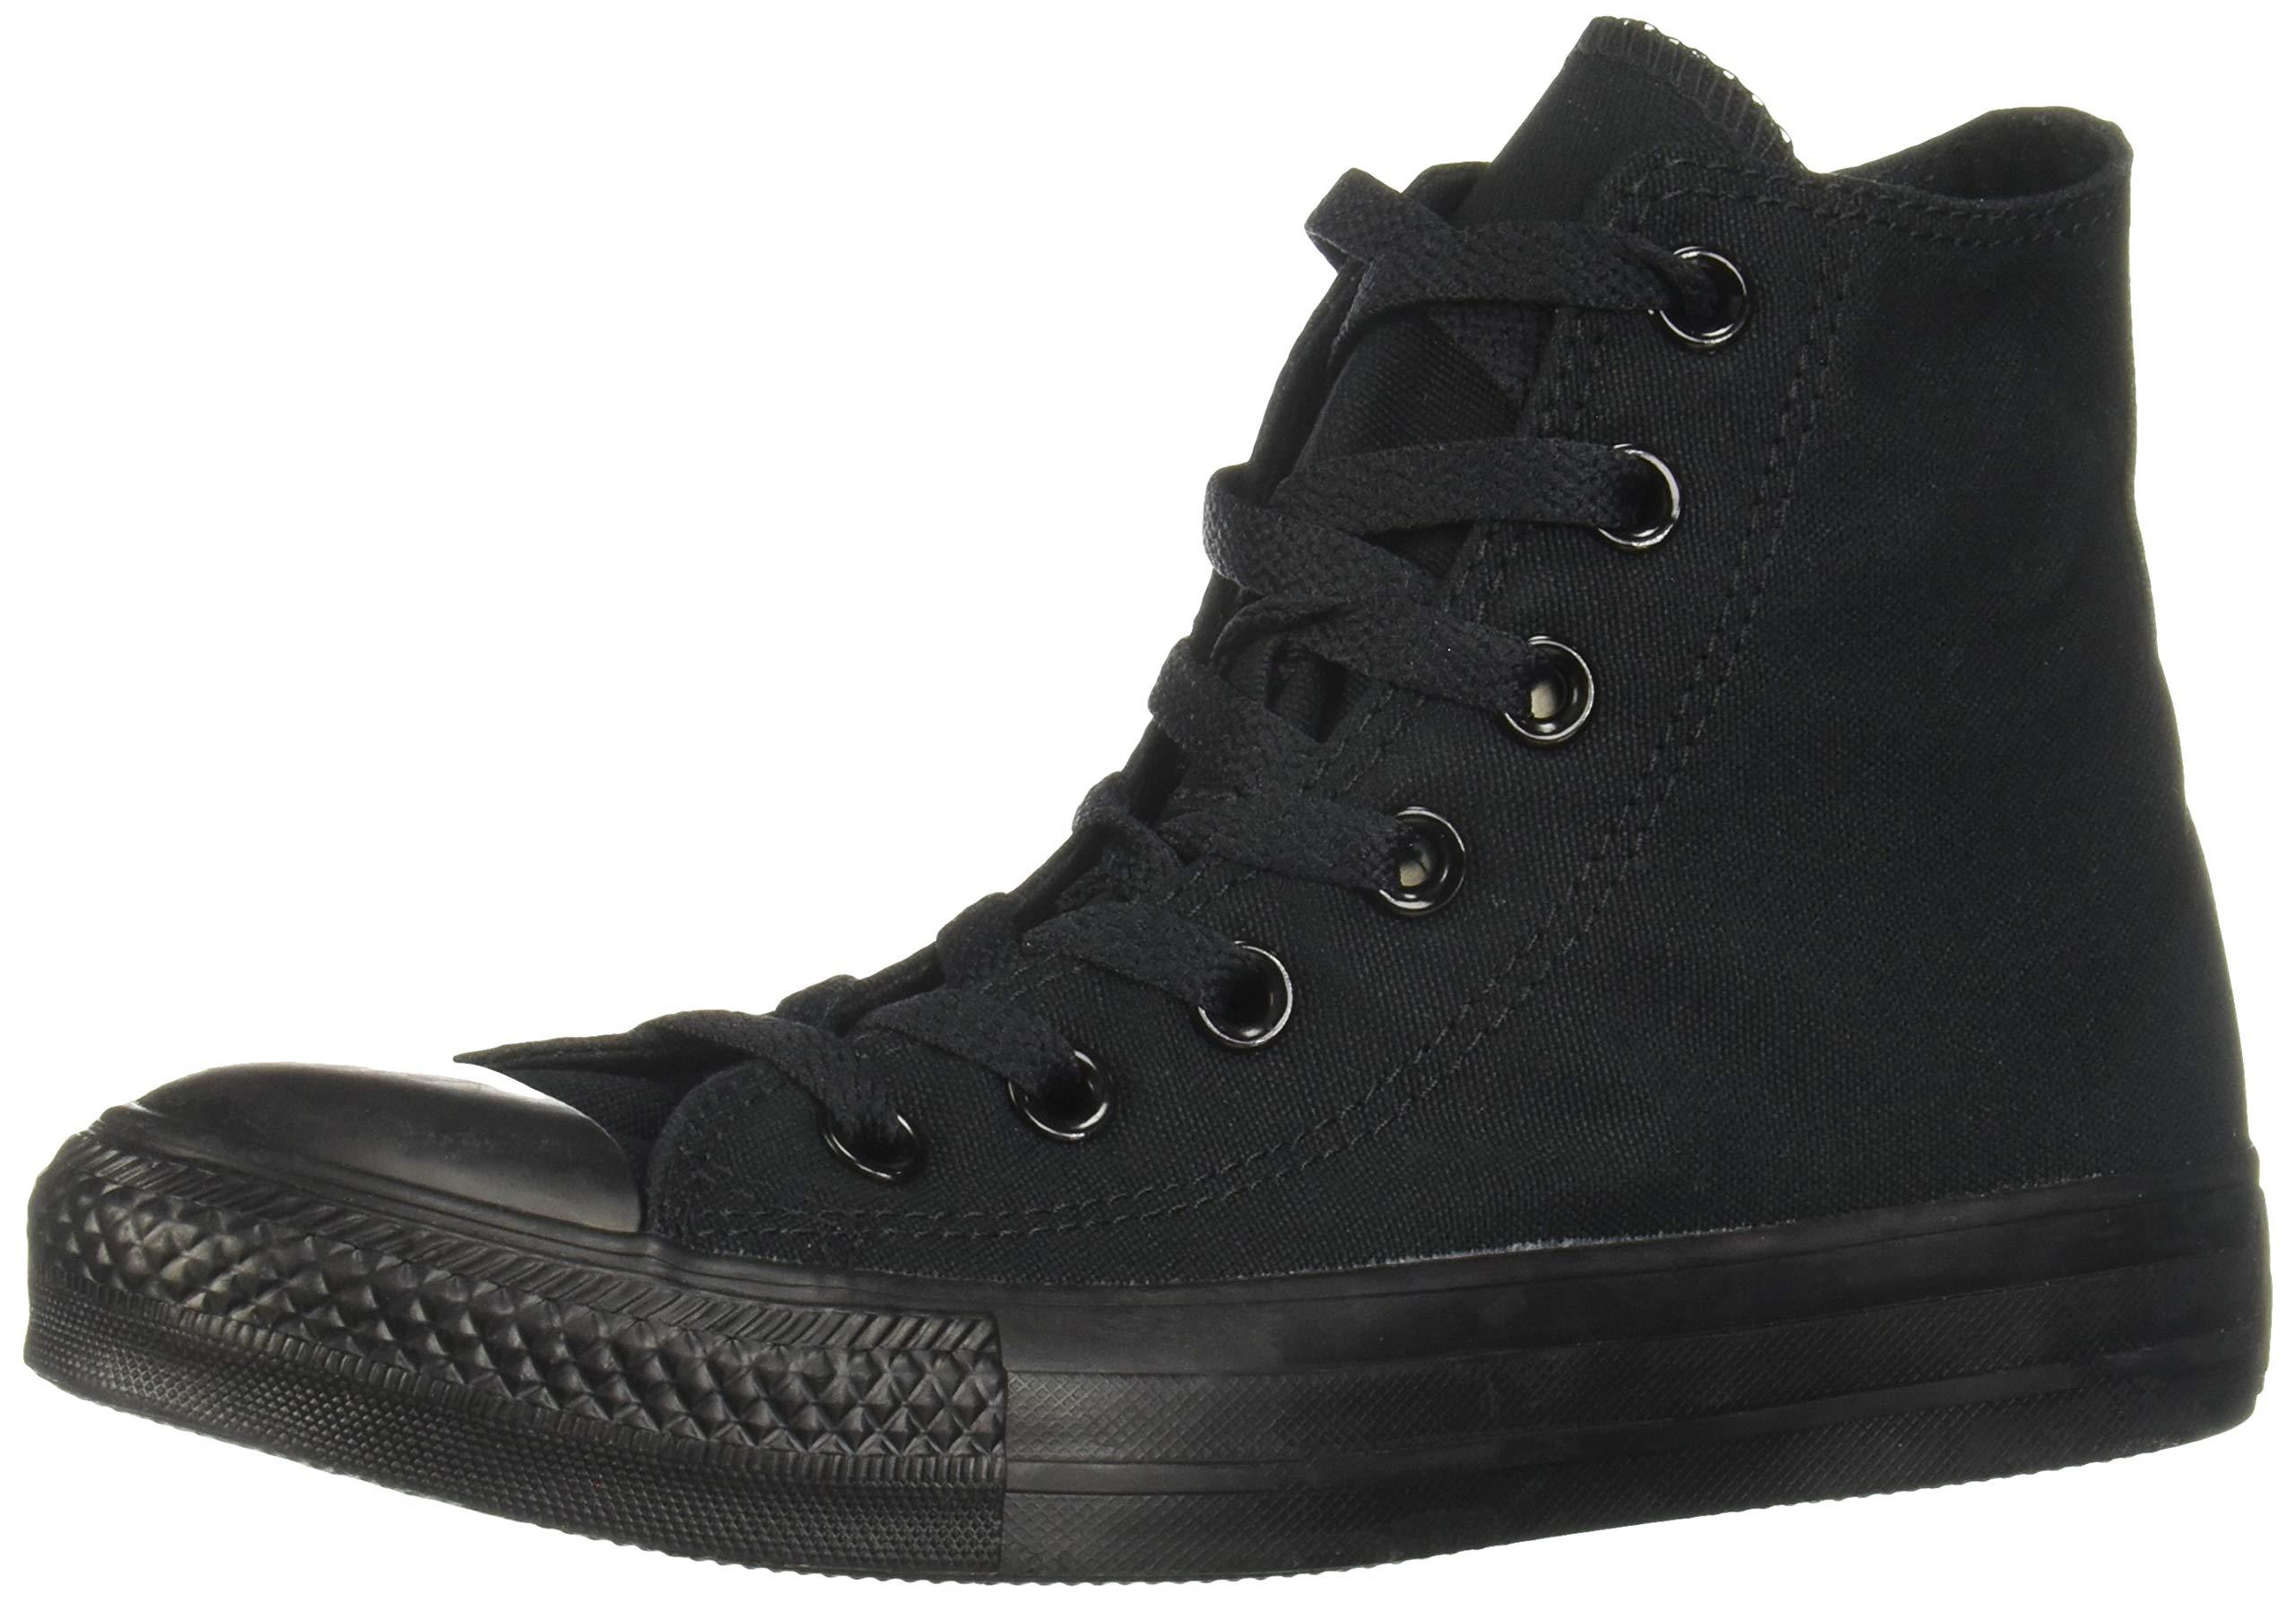 f59810d6ae1 Galleon - Converse Chuck Taylor All Star Shoes (M3310) Hi Black Monochrome